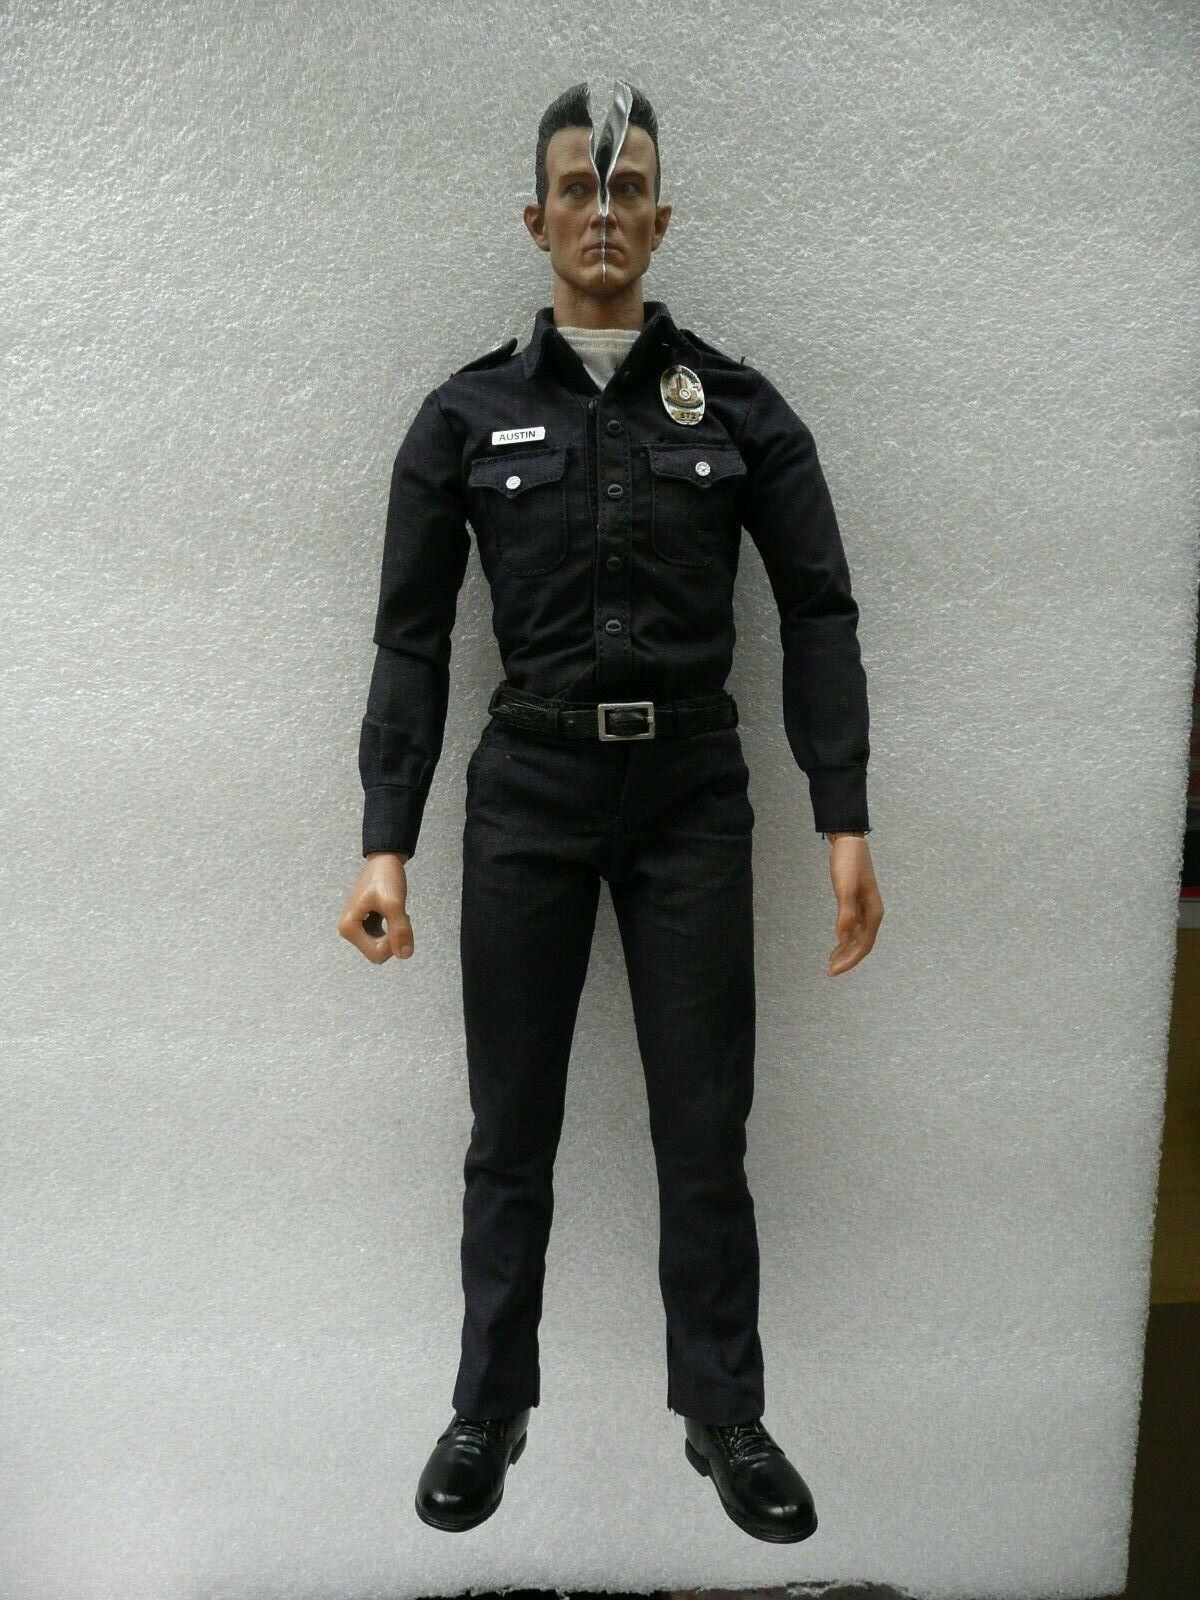 Authentic Loose Hot Toys 1/6 Terminator Robert Patrick T-1000 T2 Action Figure on eBay thumbnail